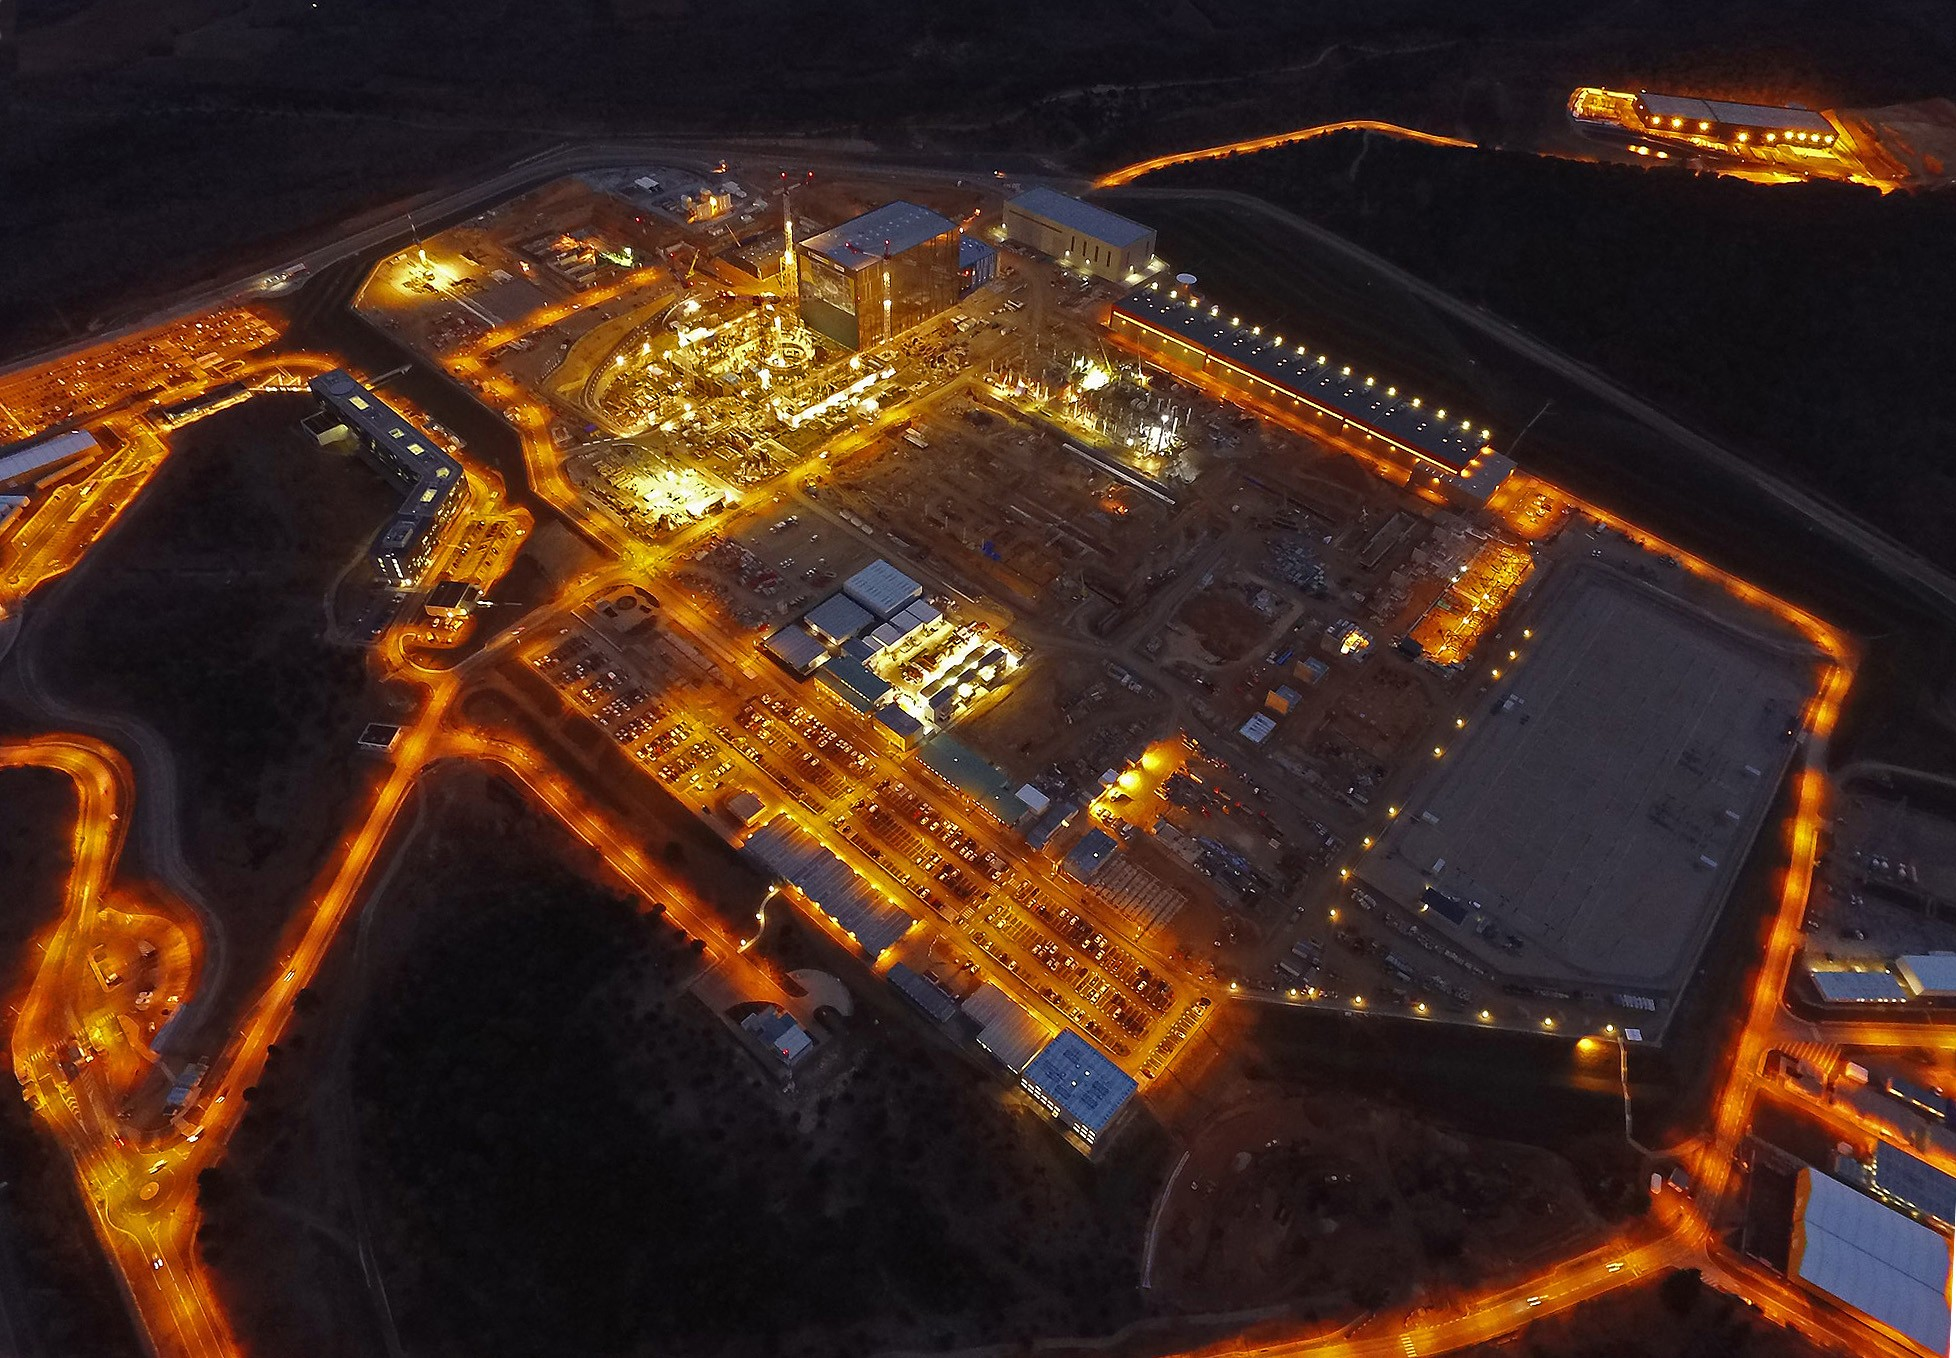 Красивое воздушное фото площадки ИТЭР